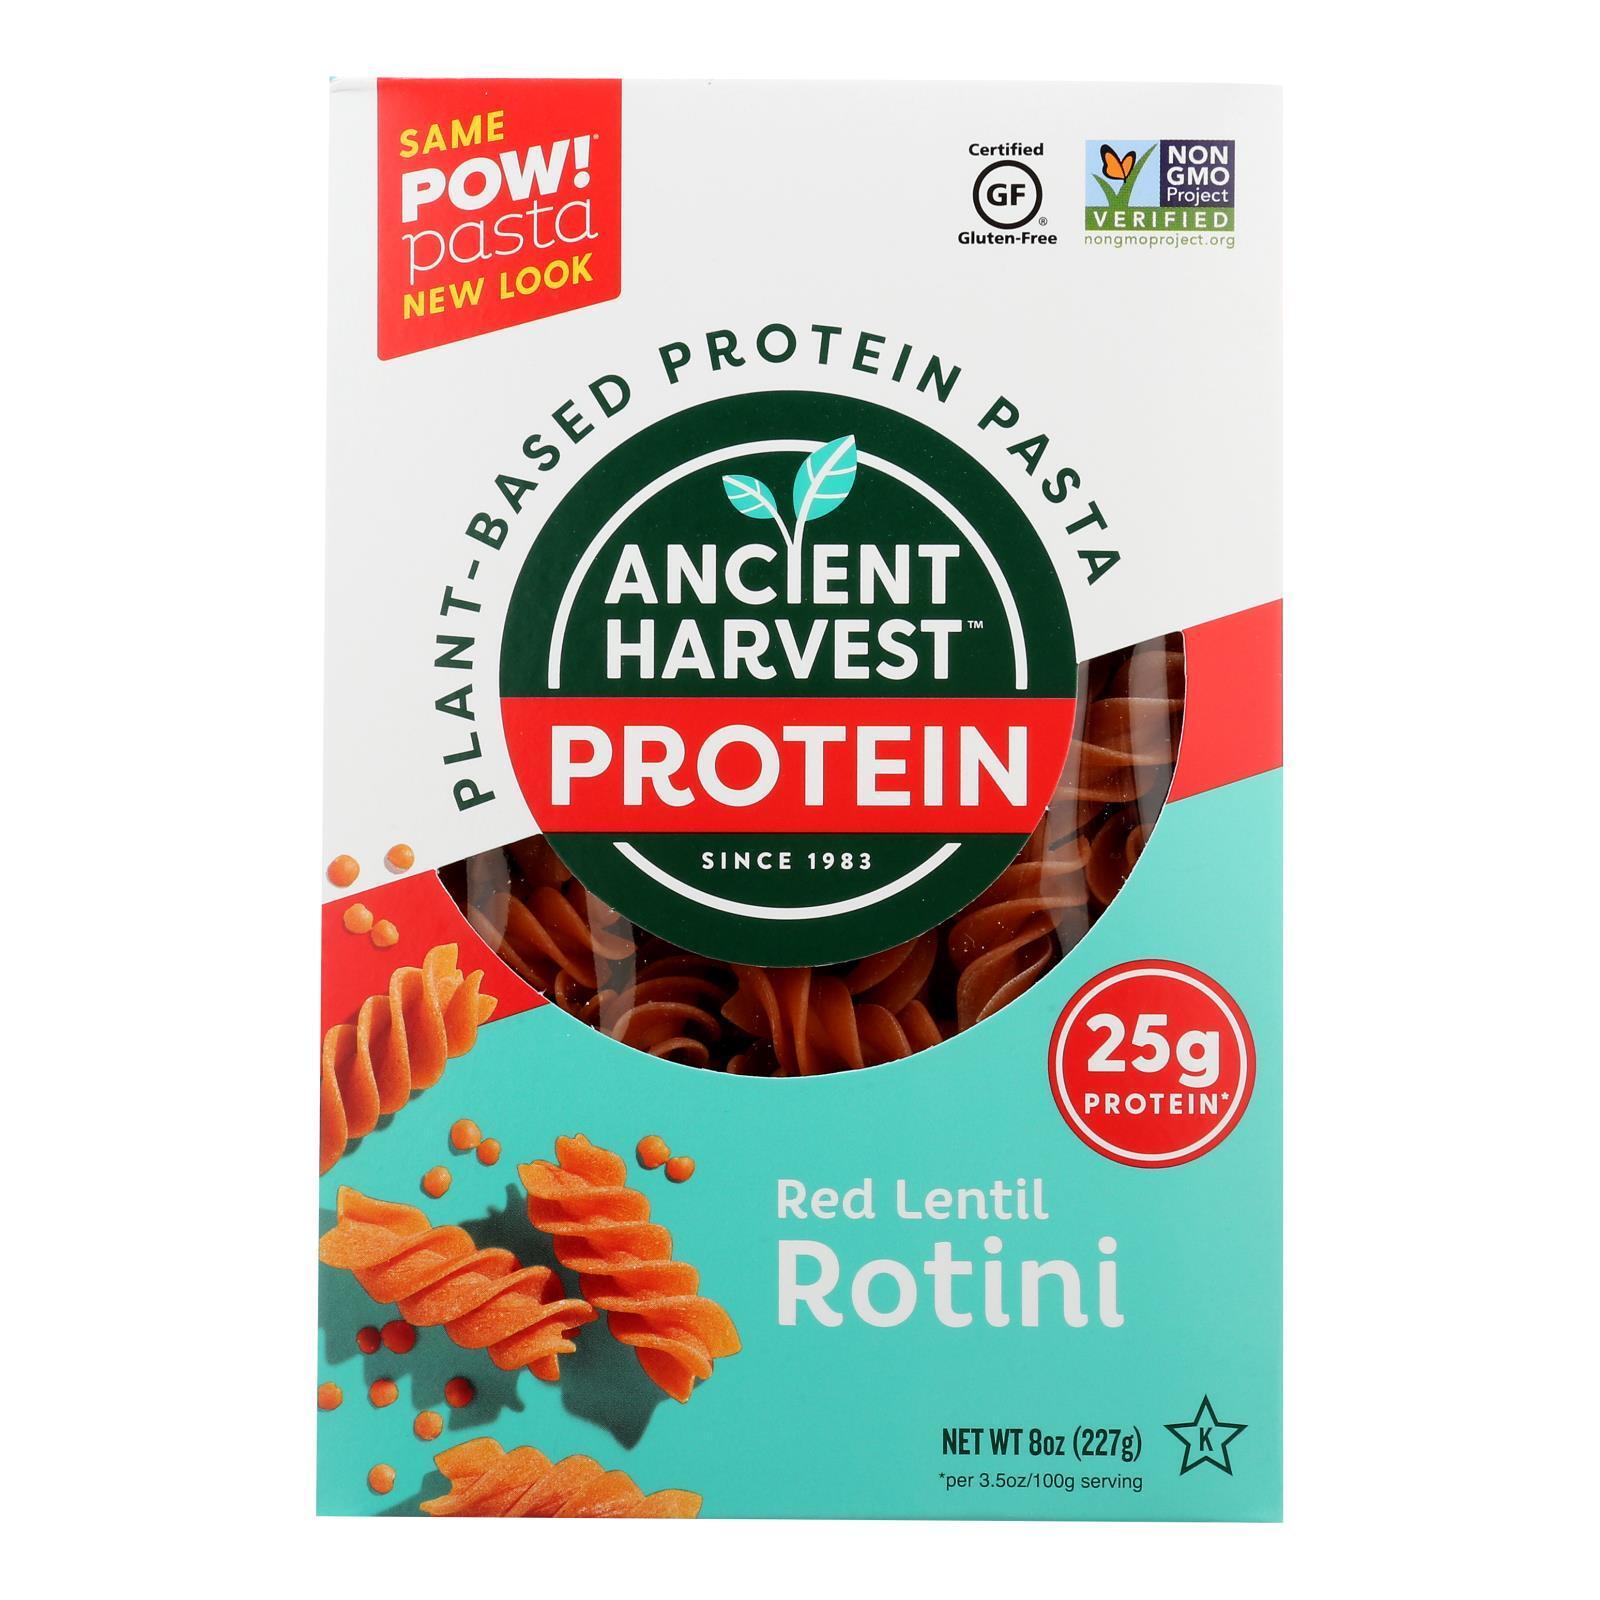 Ancient Harvest Pasta - Supergrain - Red Lentil and Quinoa Rotelle - Gluten Free - 8 oz - case of 6